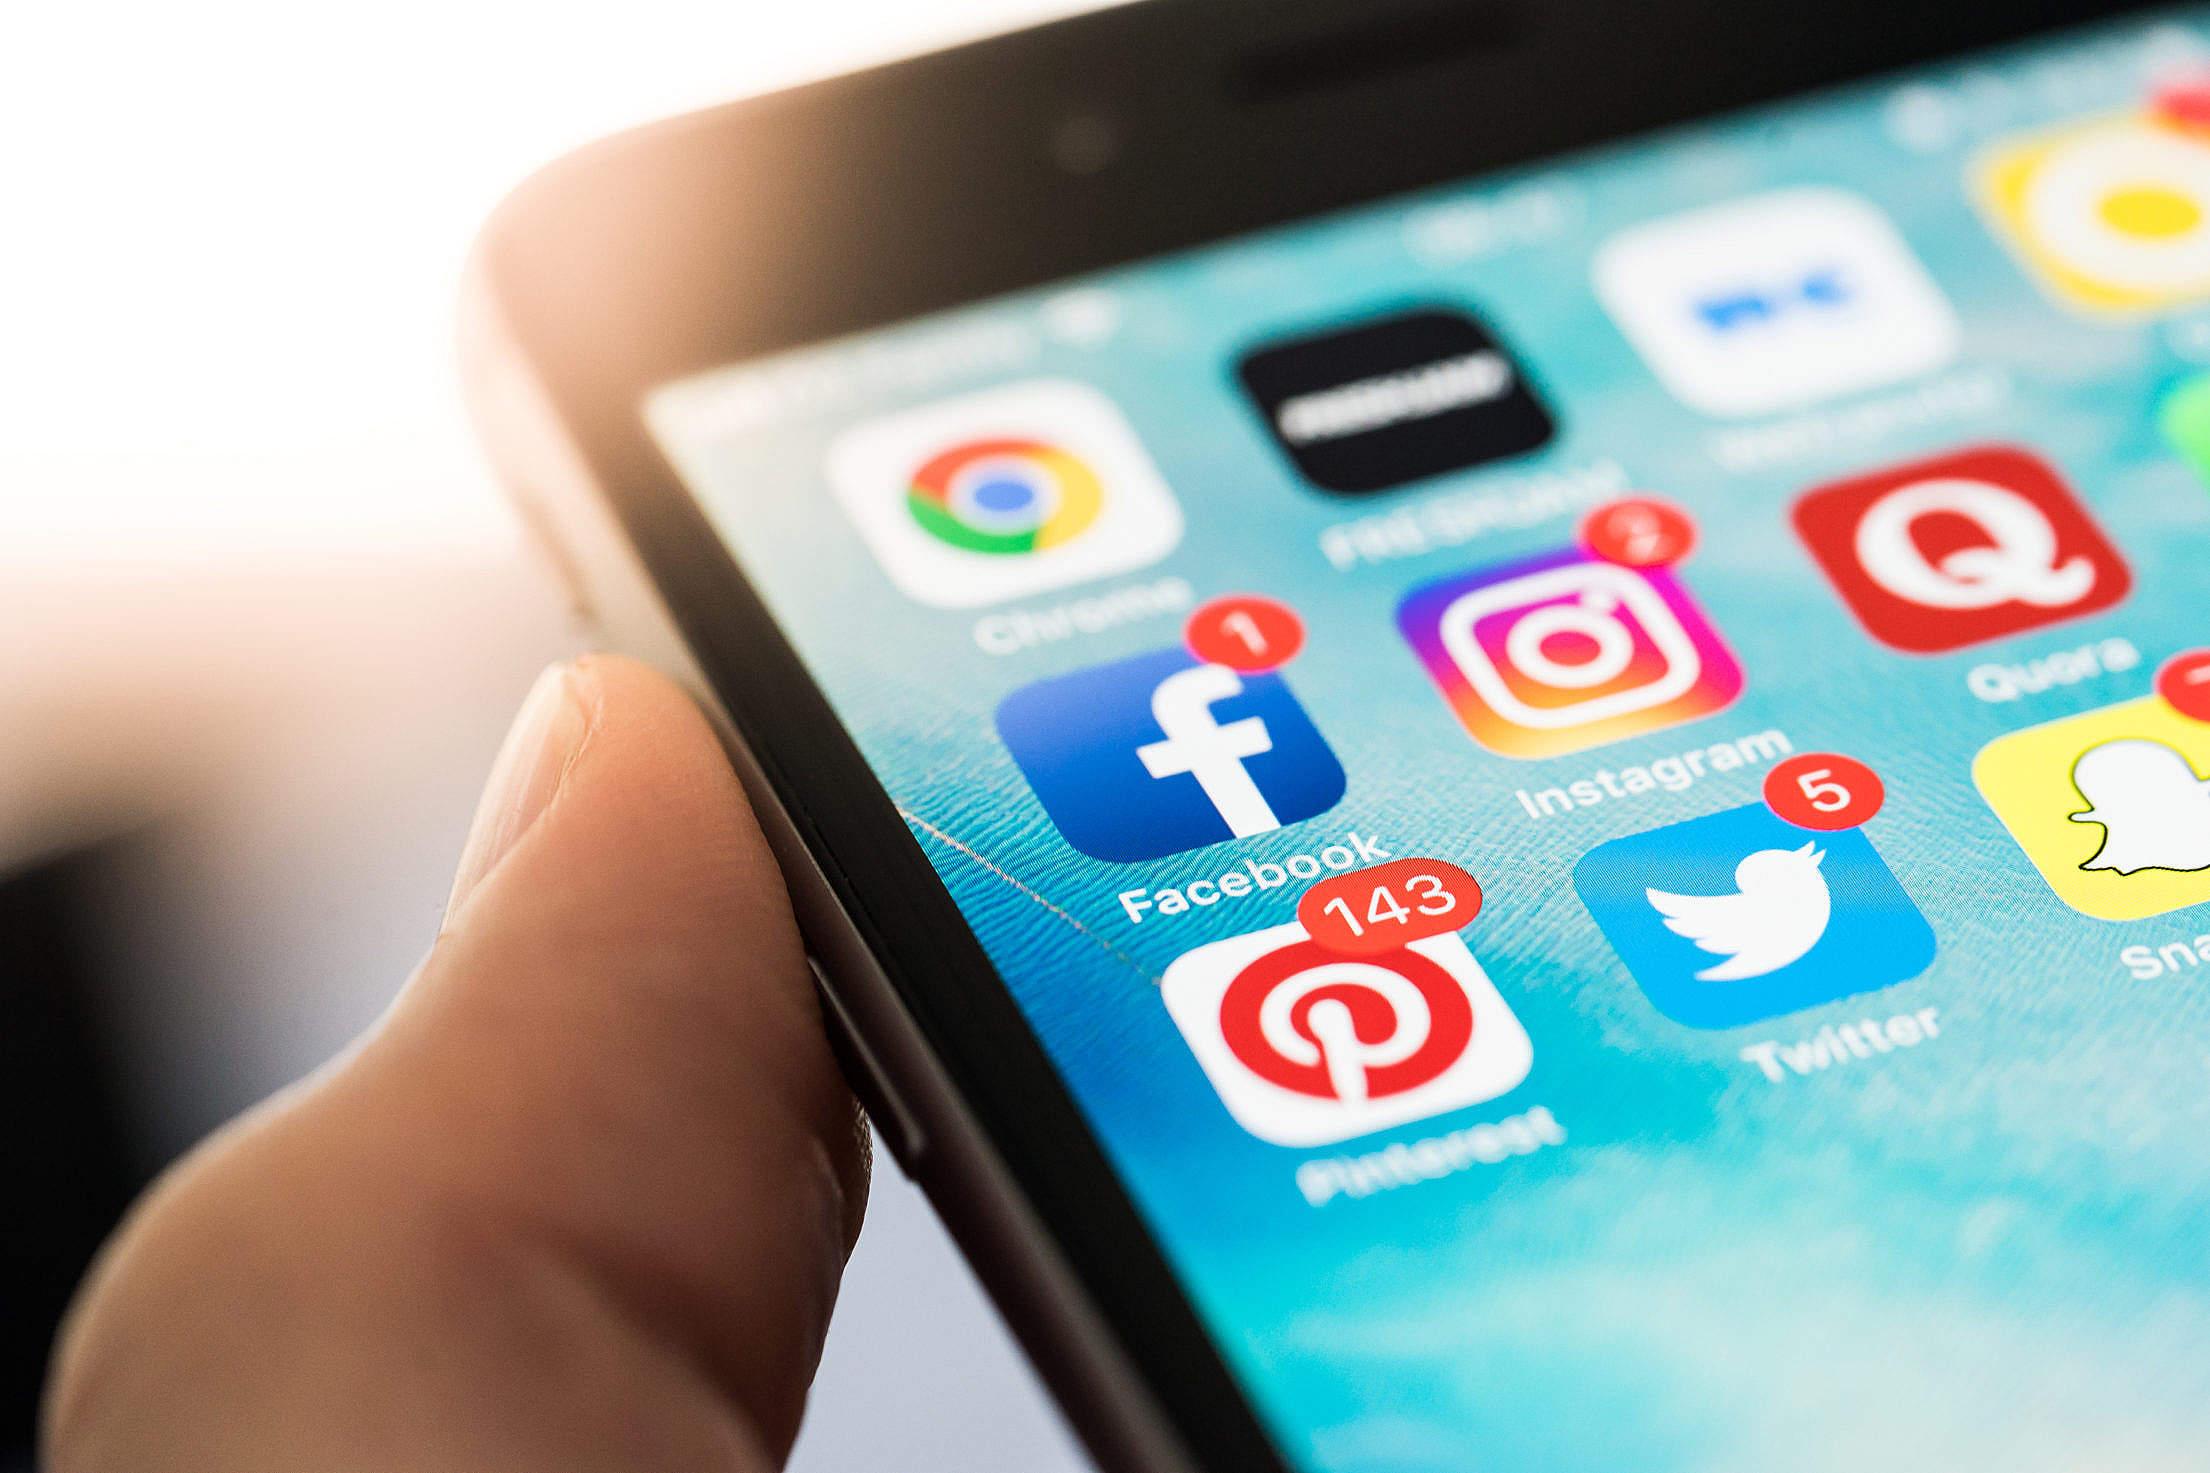 Social Media App Icons on Smartphone Free Stock Photo